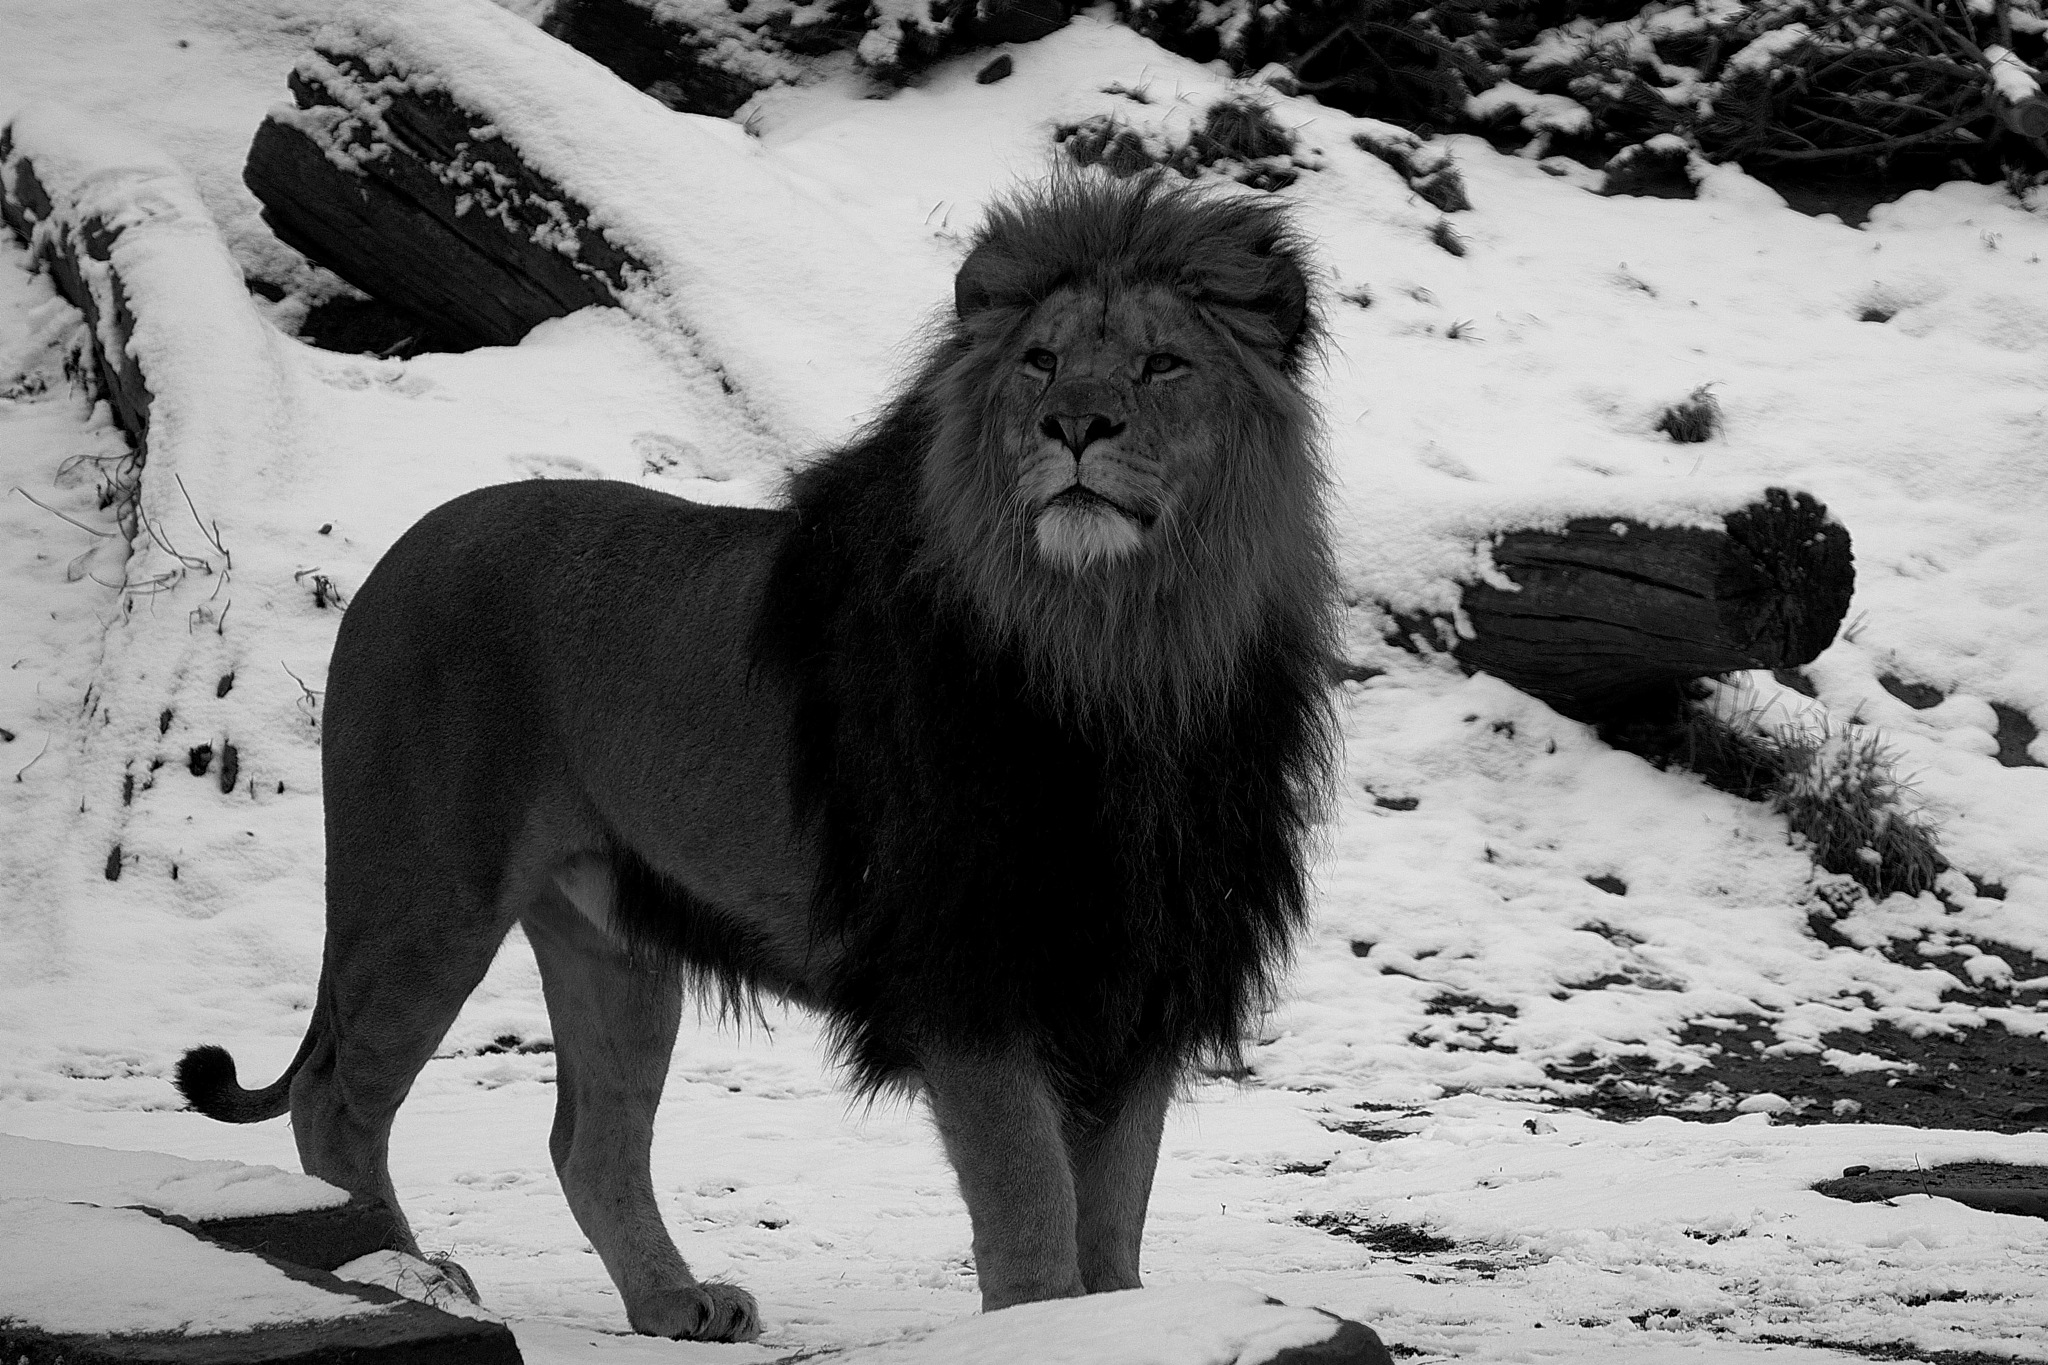 Lion b&w by Mogens